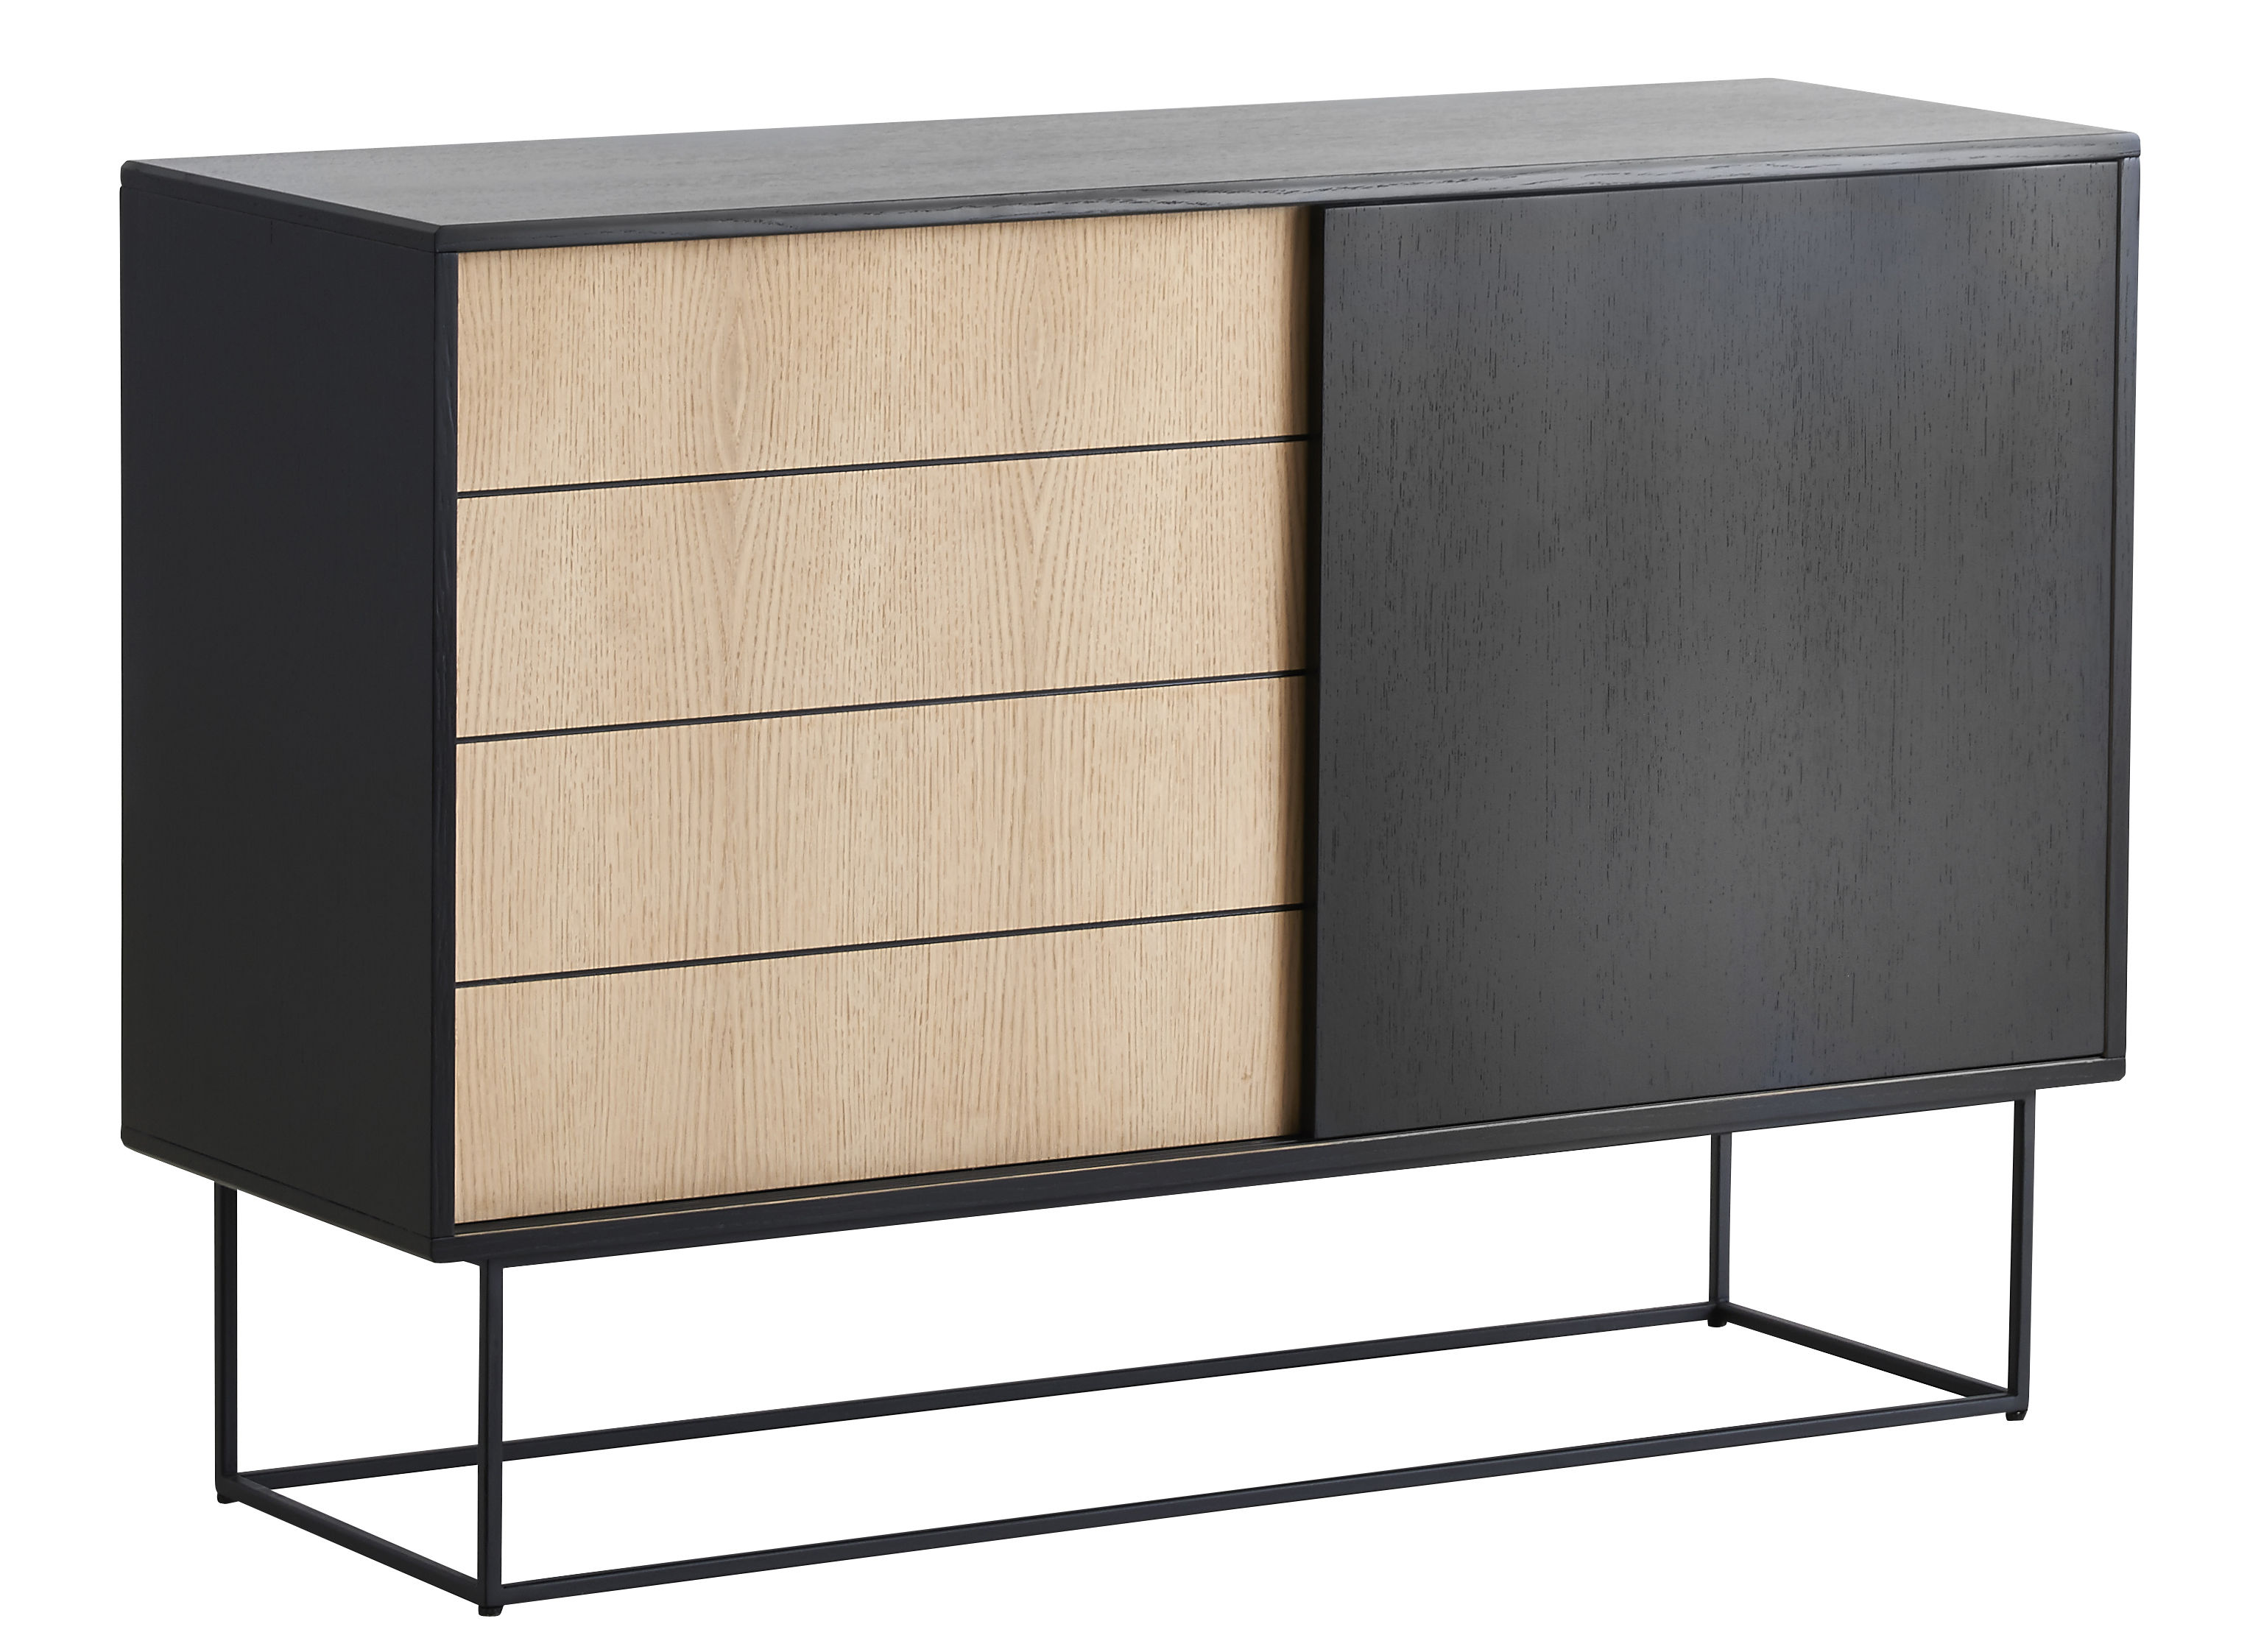 Furniture - Dressers & Storage Units - Virka High Dresser - W 120 x H 82 cm by Woud - Natural wood / Black - Metal, Oak plywood